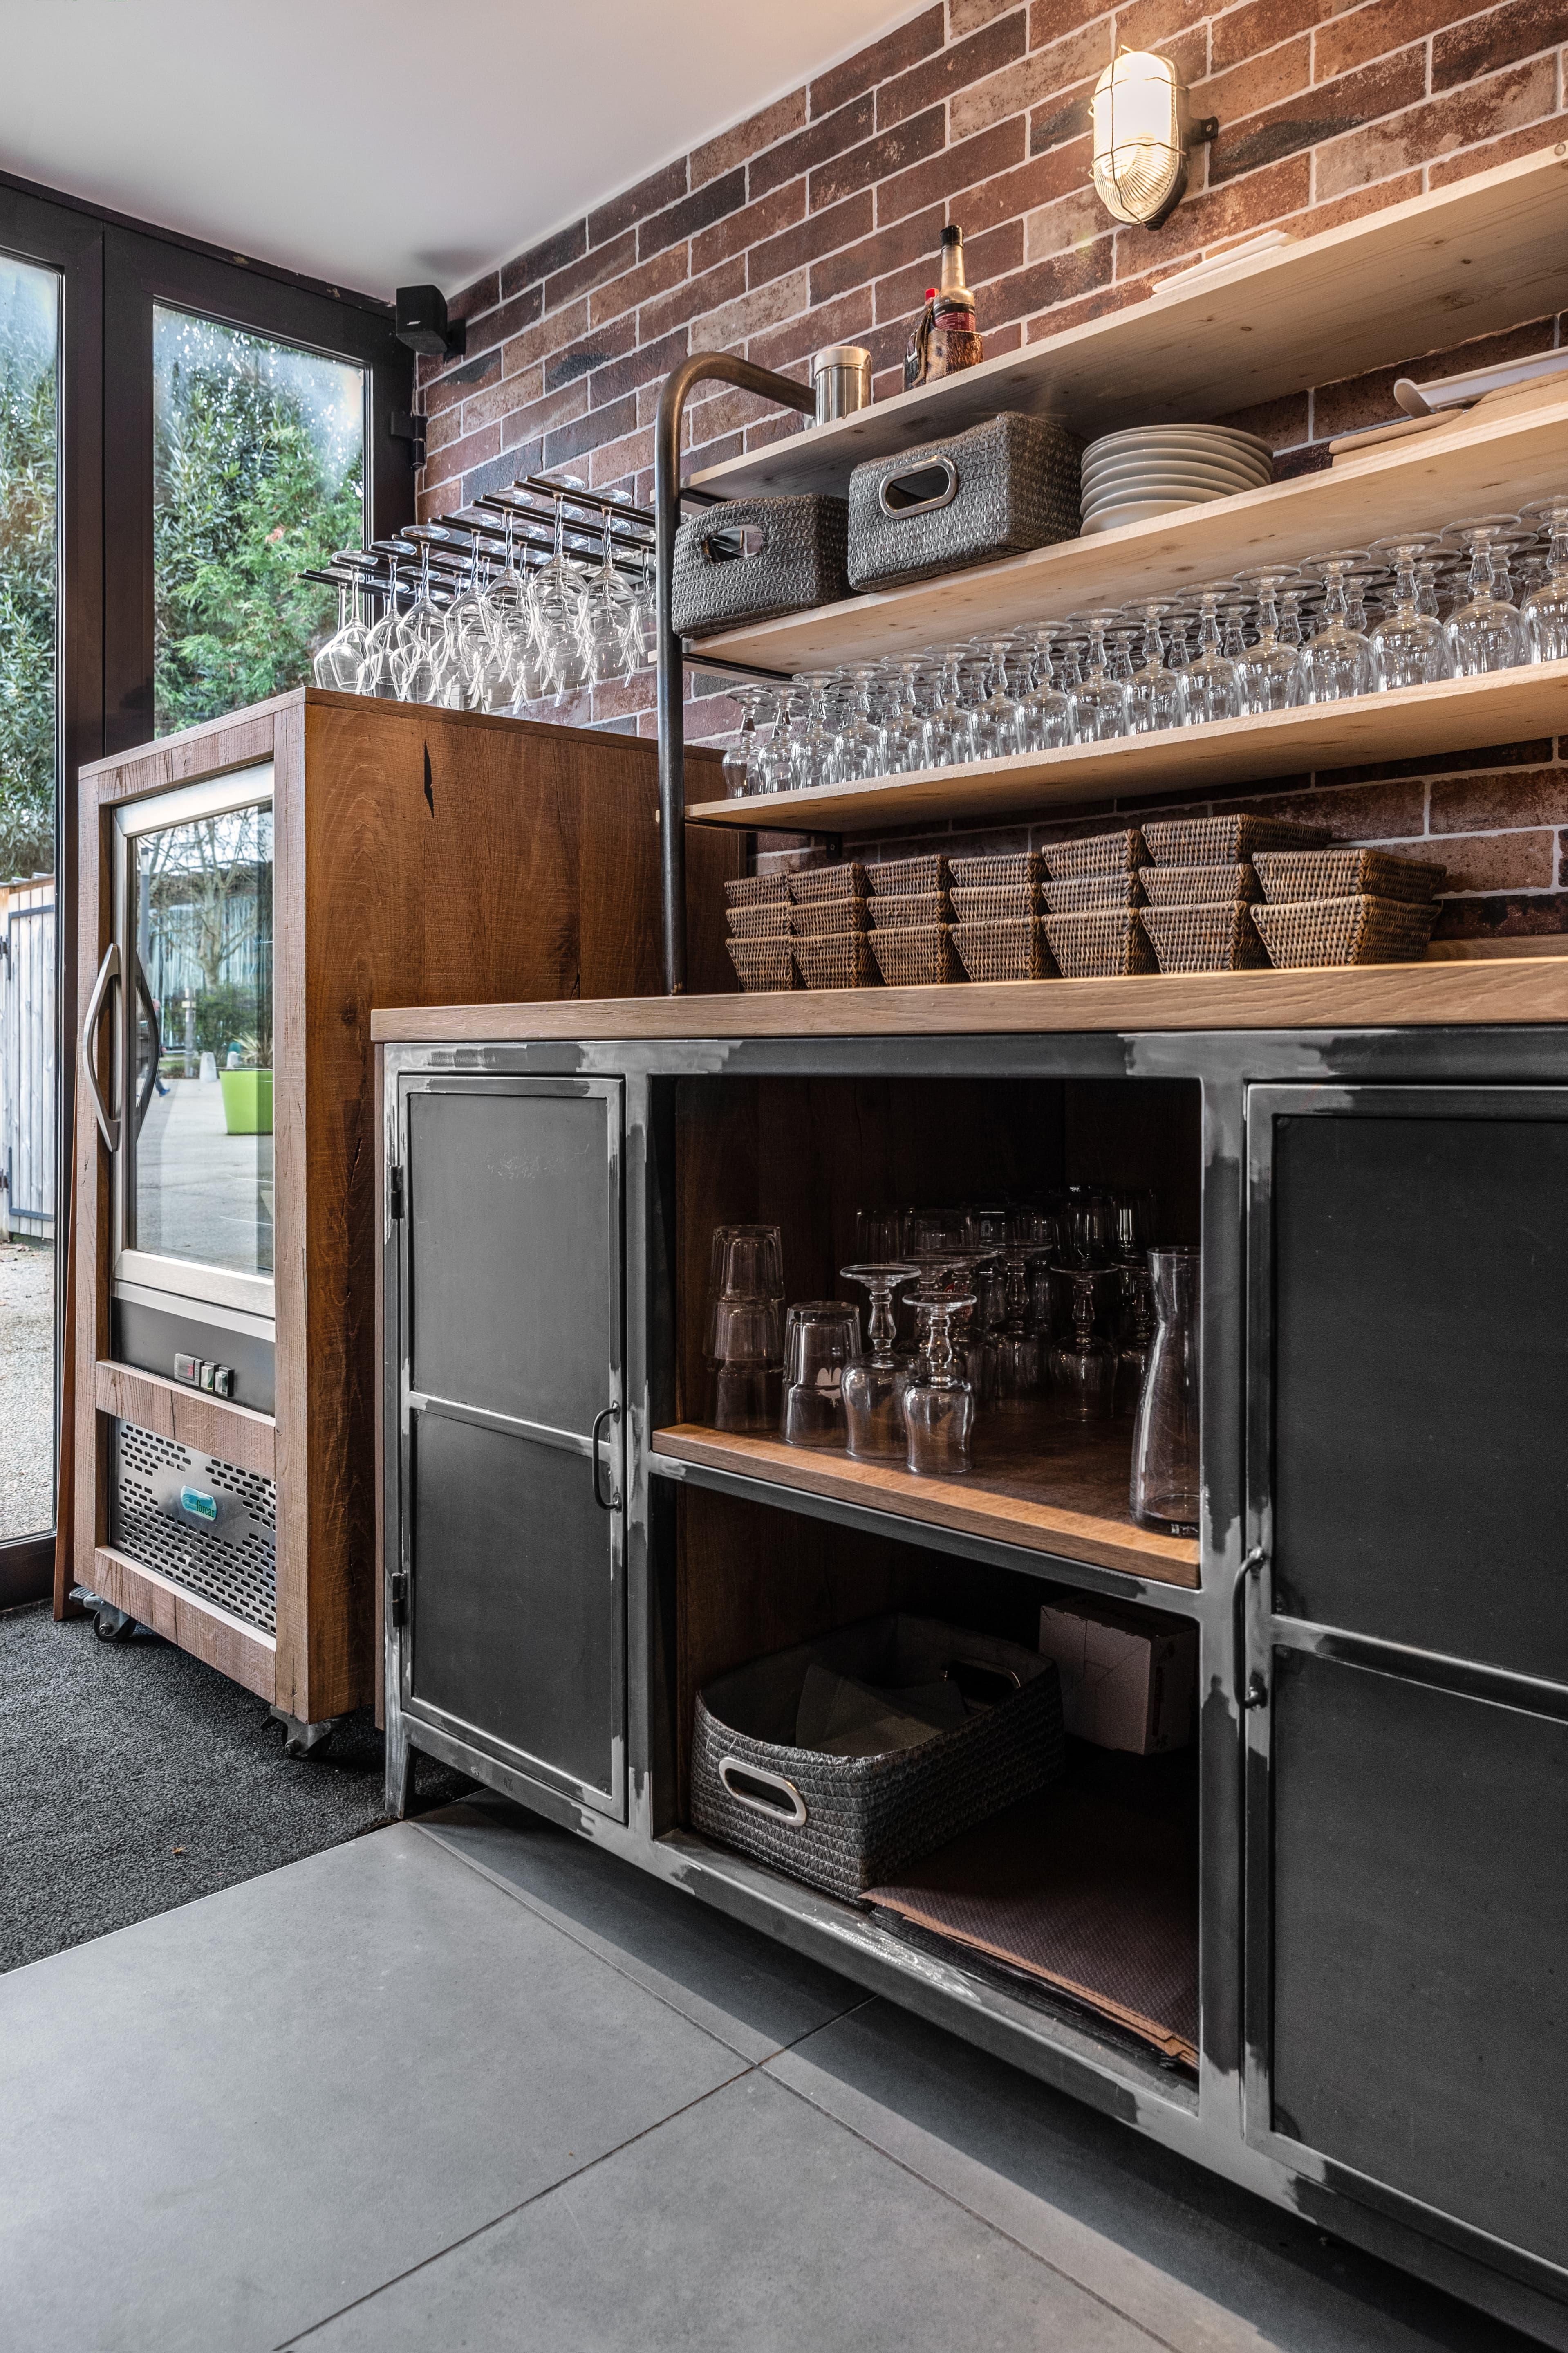 robi design metallique Annecy Cafe des sports Rumilly Le Mesle Photographe-CDS_ESKIS_11-min